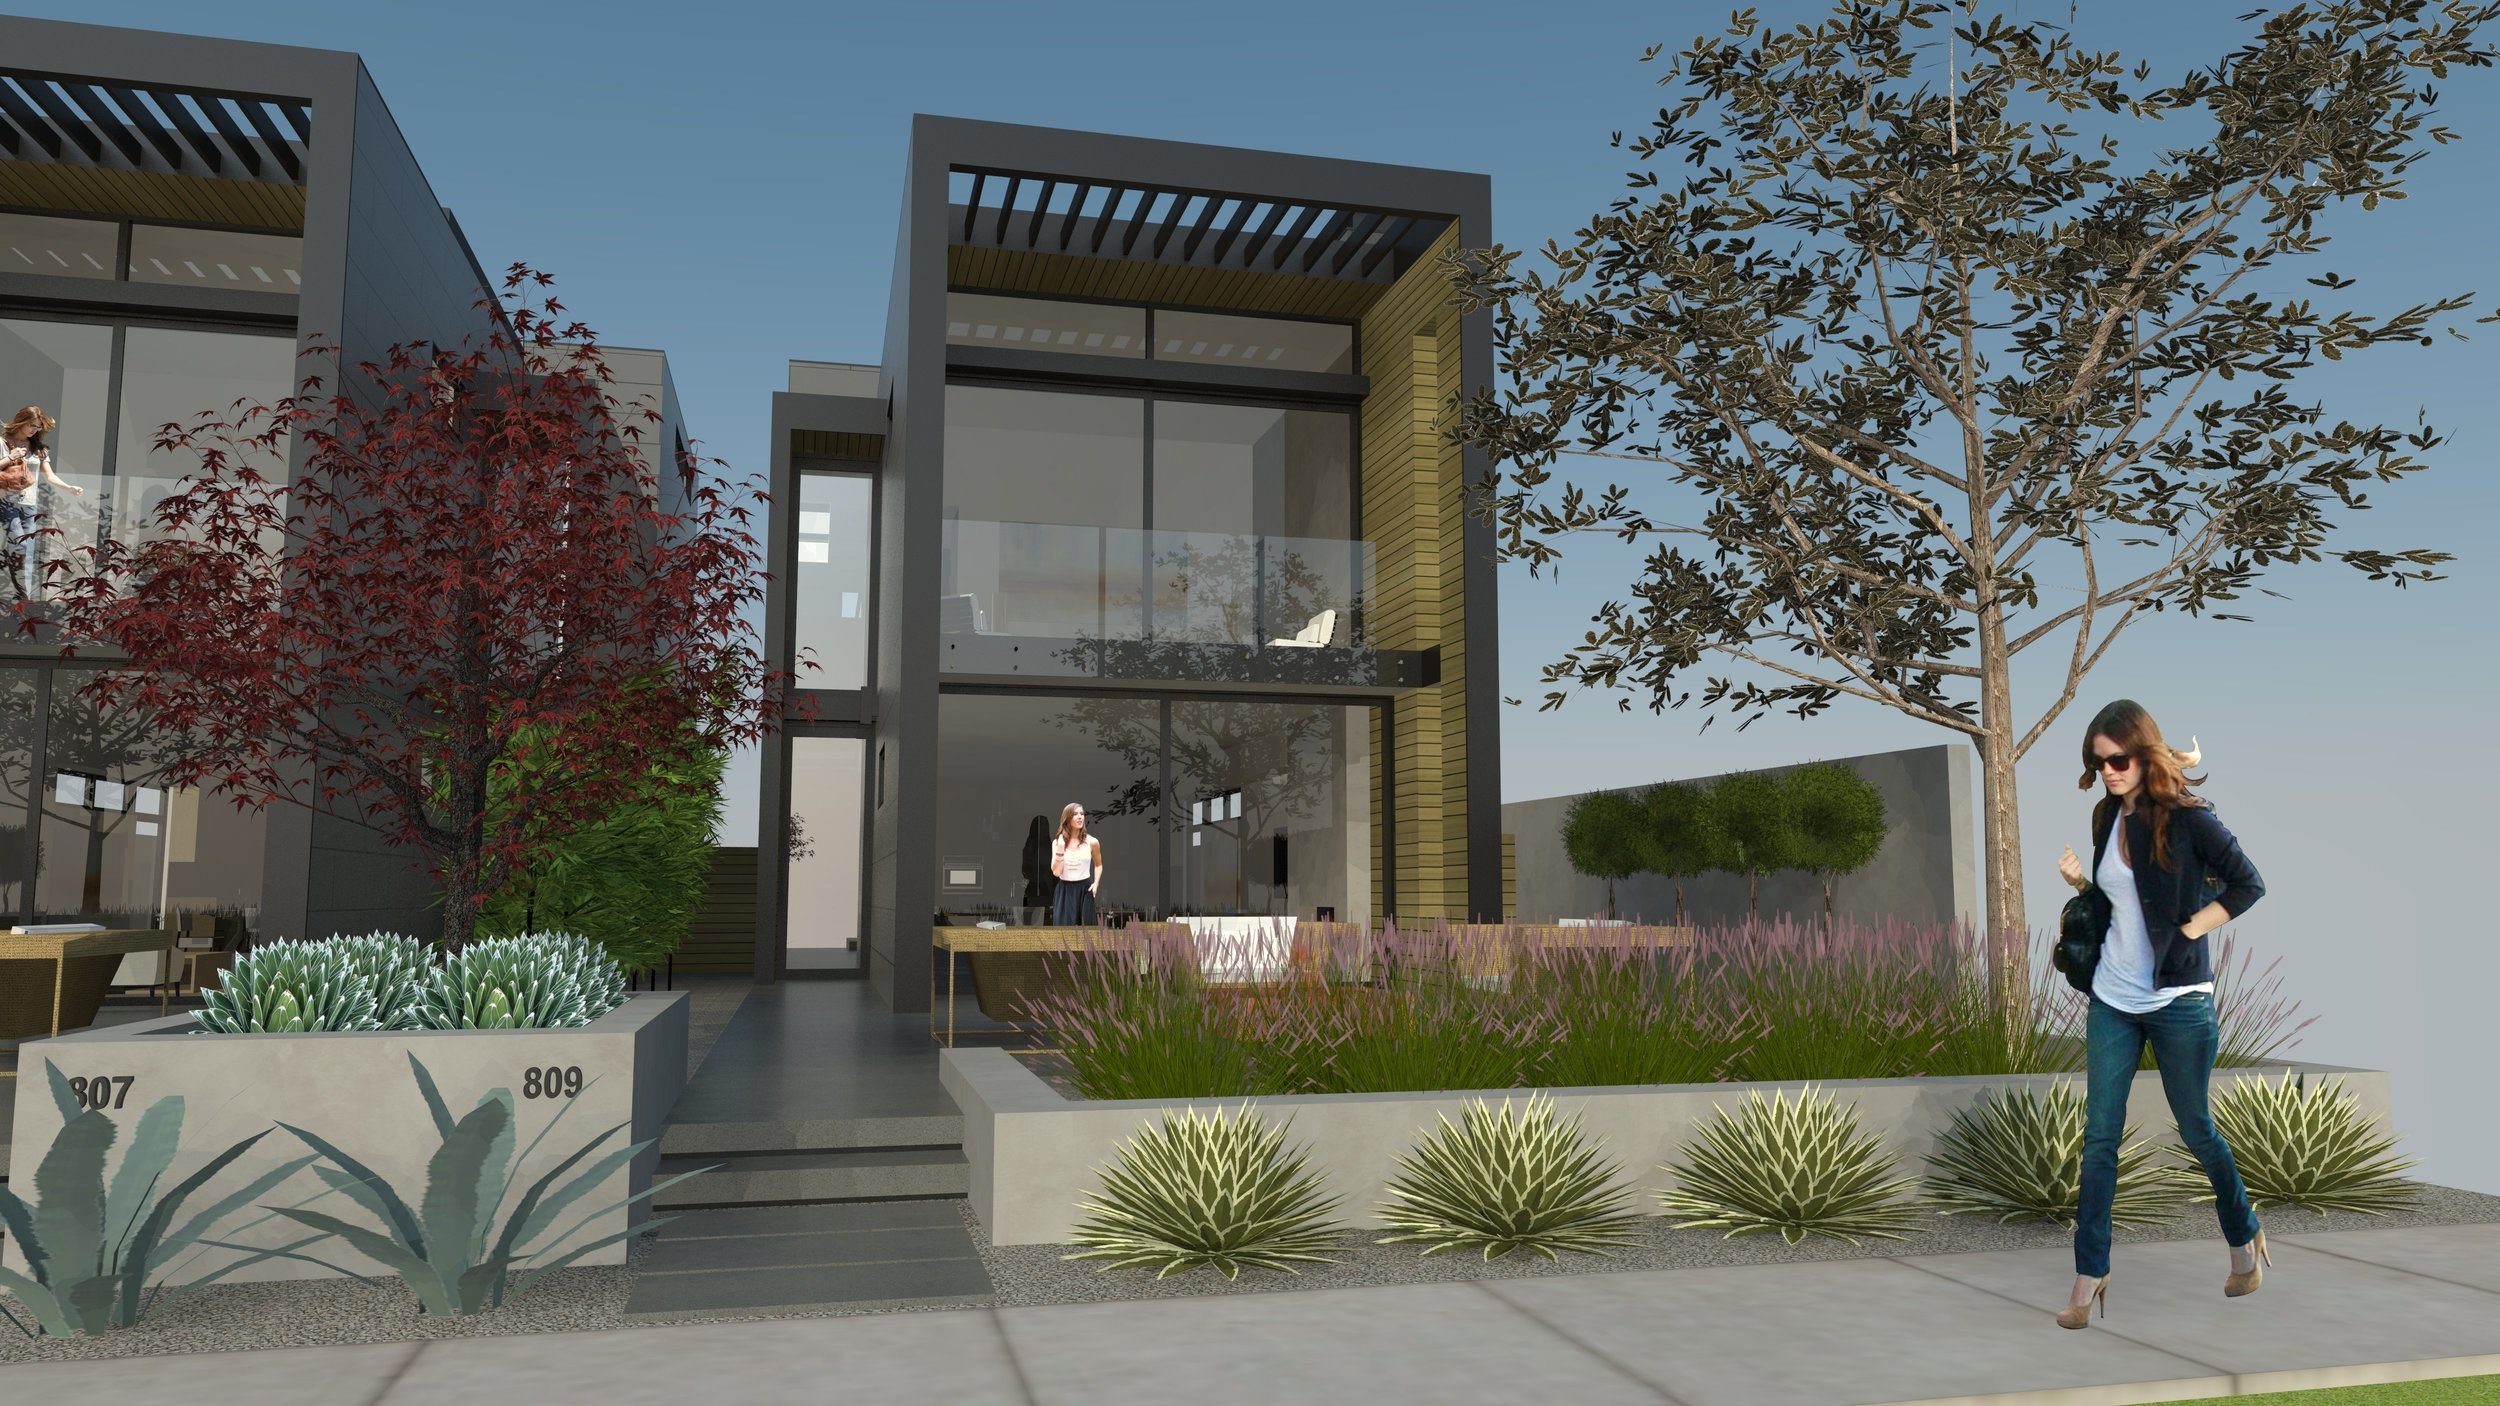 809 Huntington St. Huntington Beach CA 3 Stories, 3 Bedrooms, 3 Full Baths, 1 Half Bath 3,350 Sq. Ft